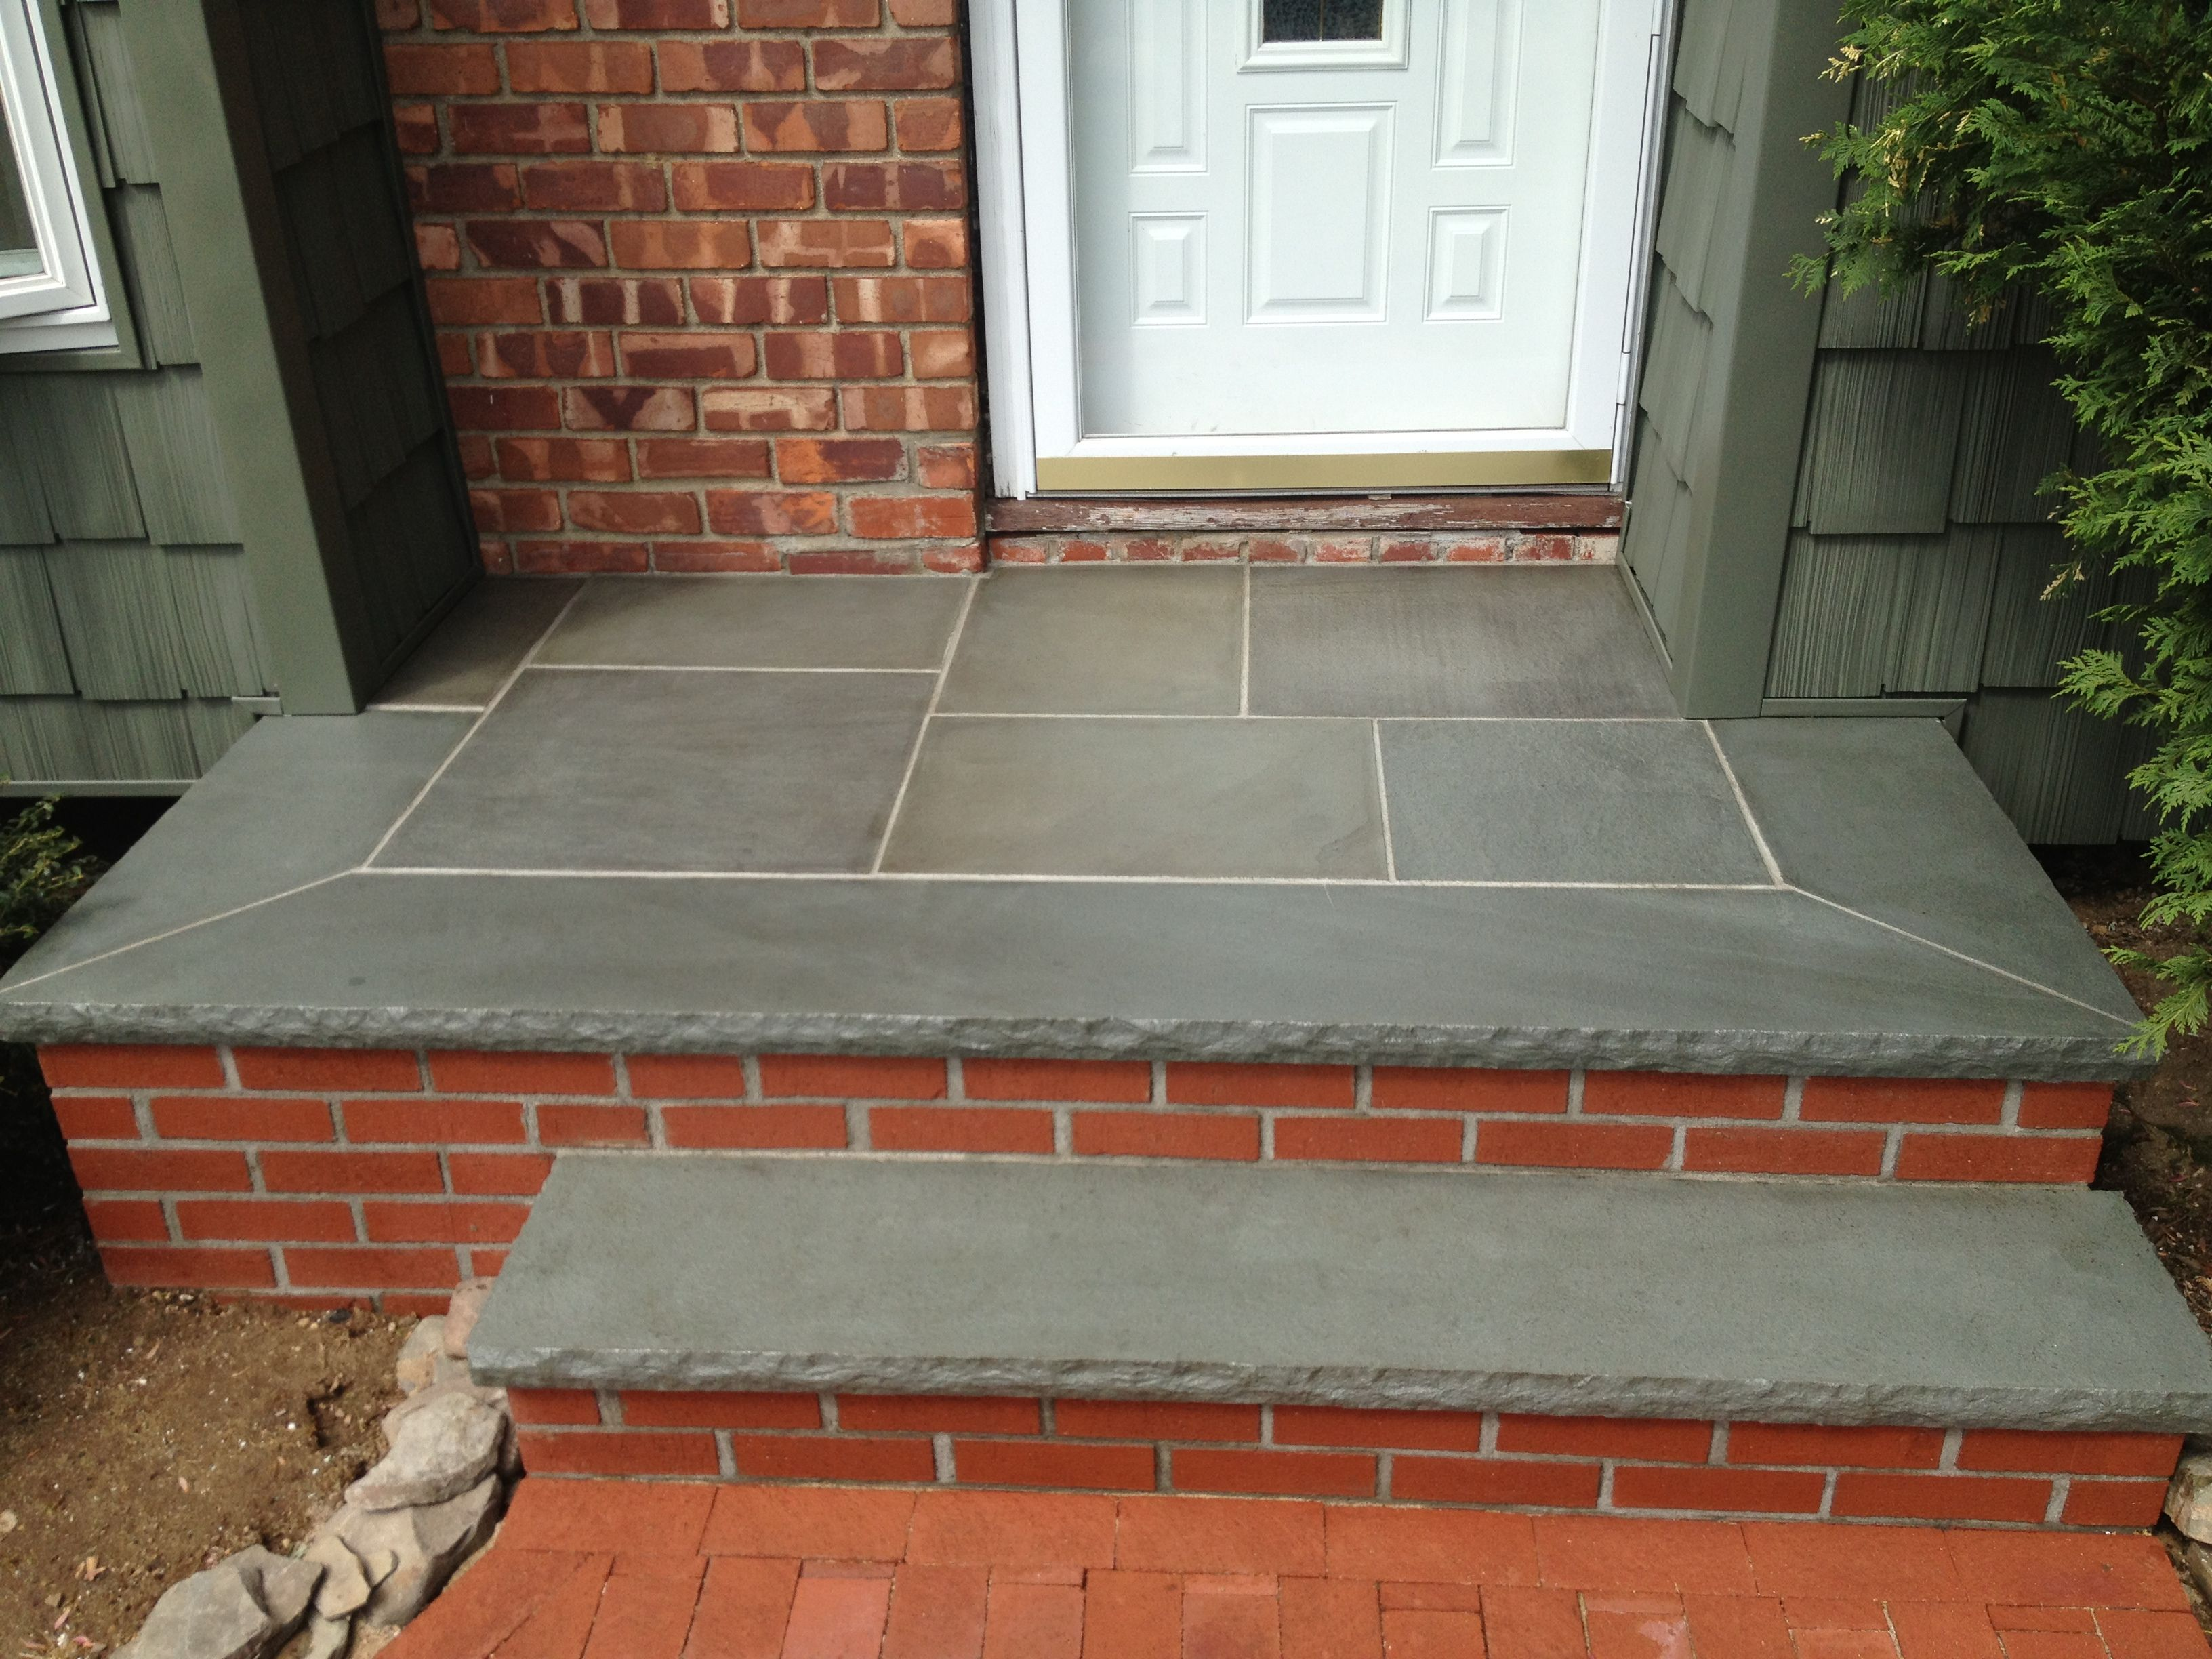 High Gloss Sealed Bluestone | Masonry Contractors | Brickwork | Stone Work  | Driveways | Patios | Paver Sealing | Consultation: Paul Saladino (631)  678 6896 ...